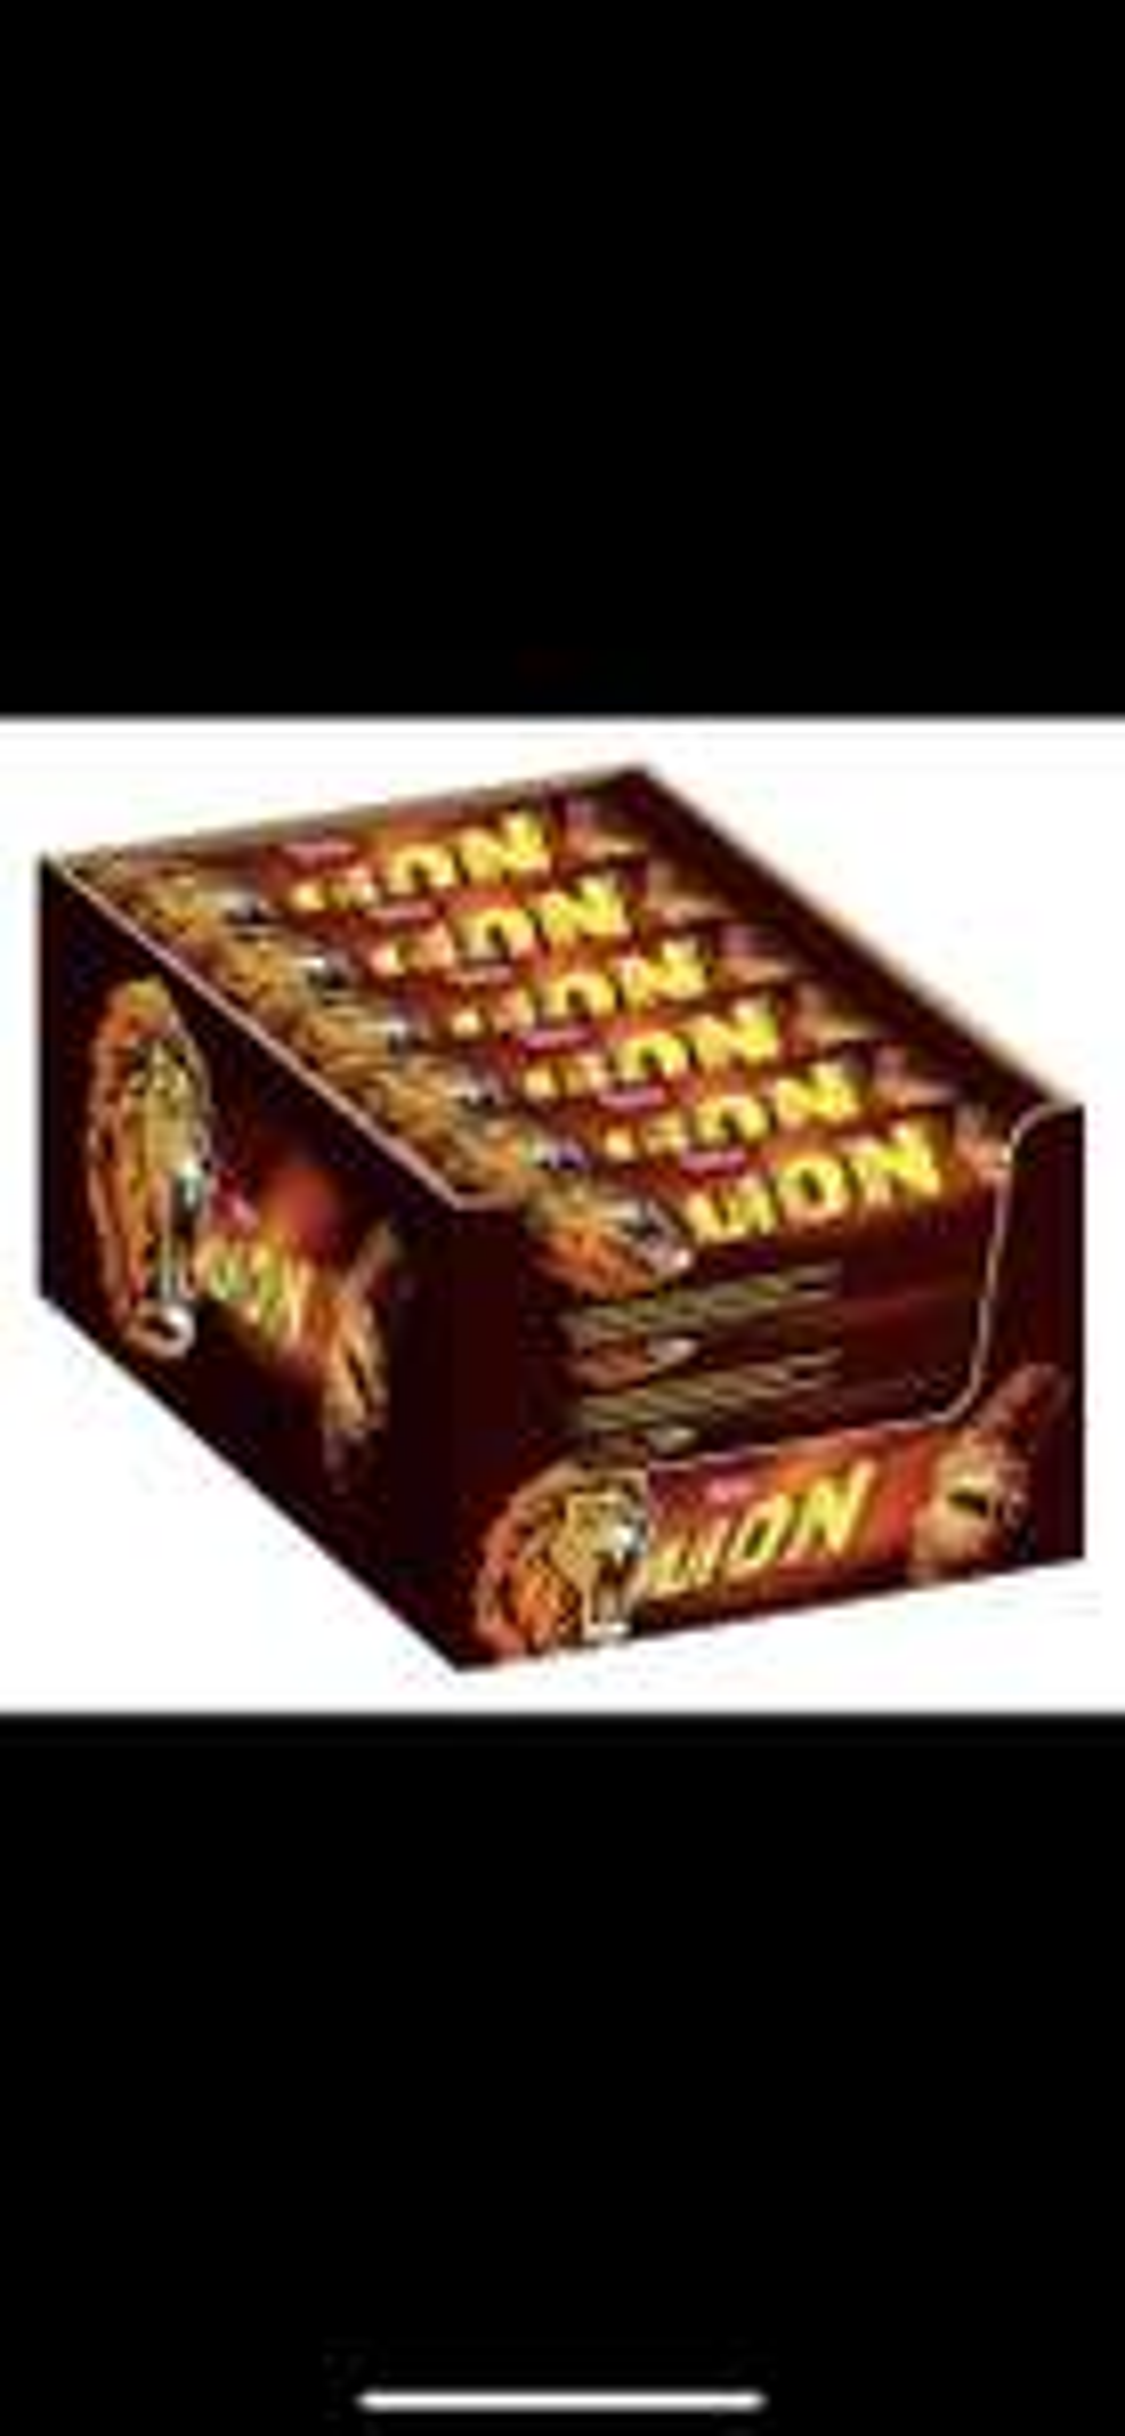 24 Lion Pack met 20% extra korting